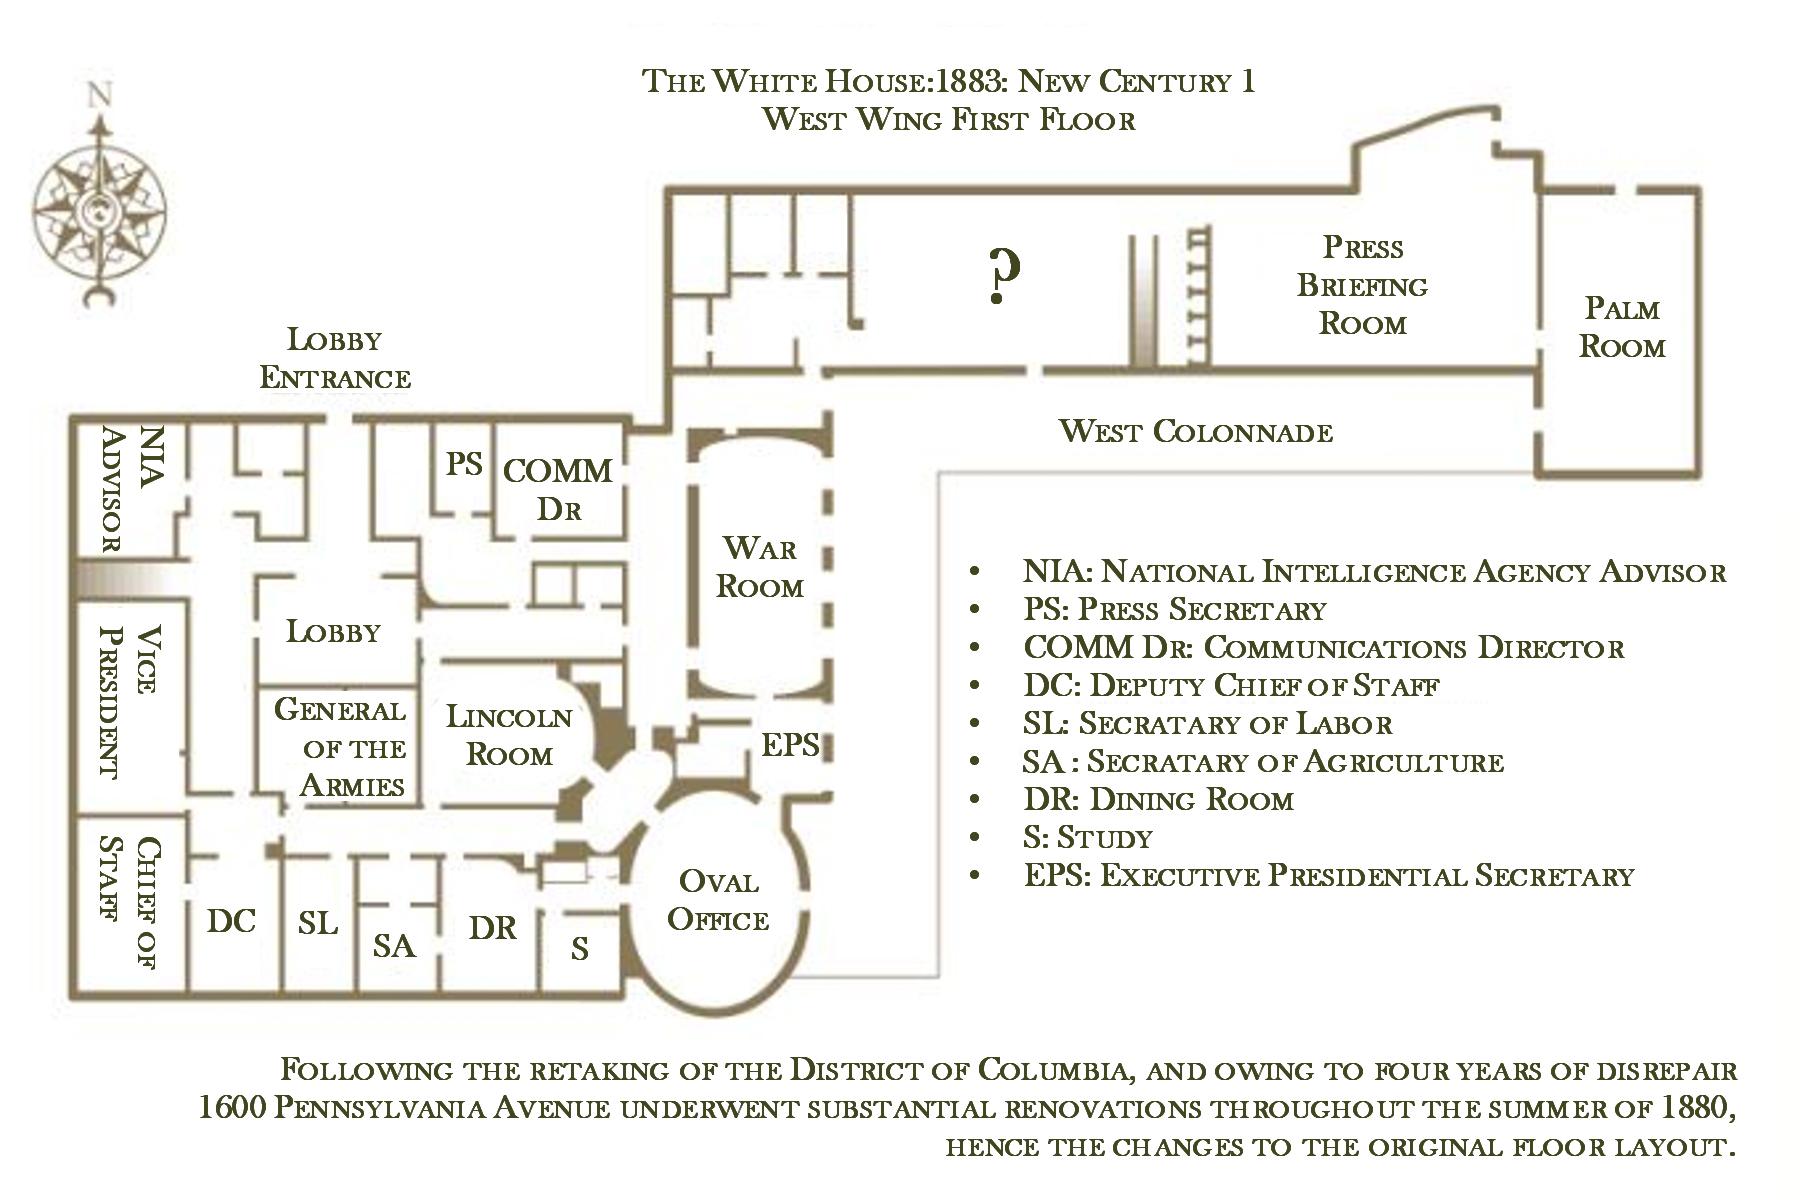 New Century's White House Floor Plan